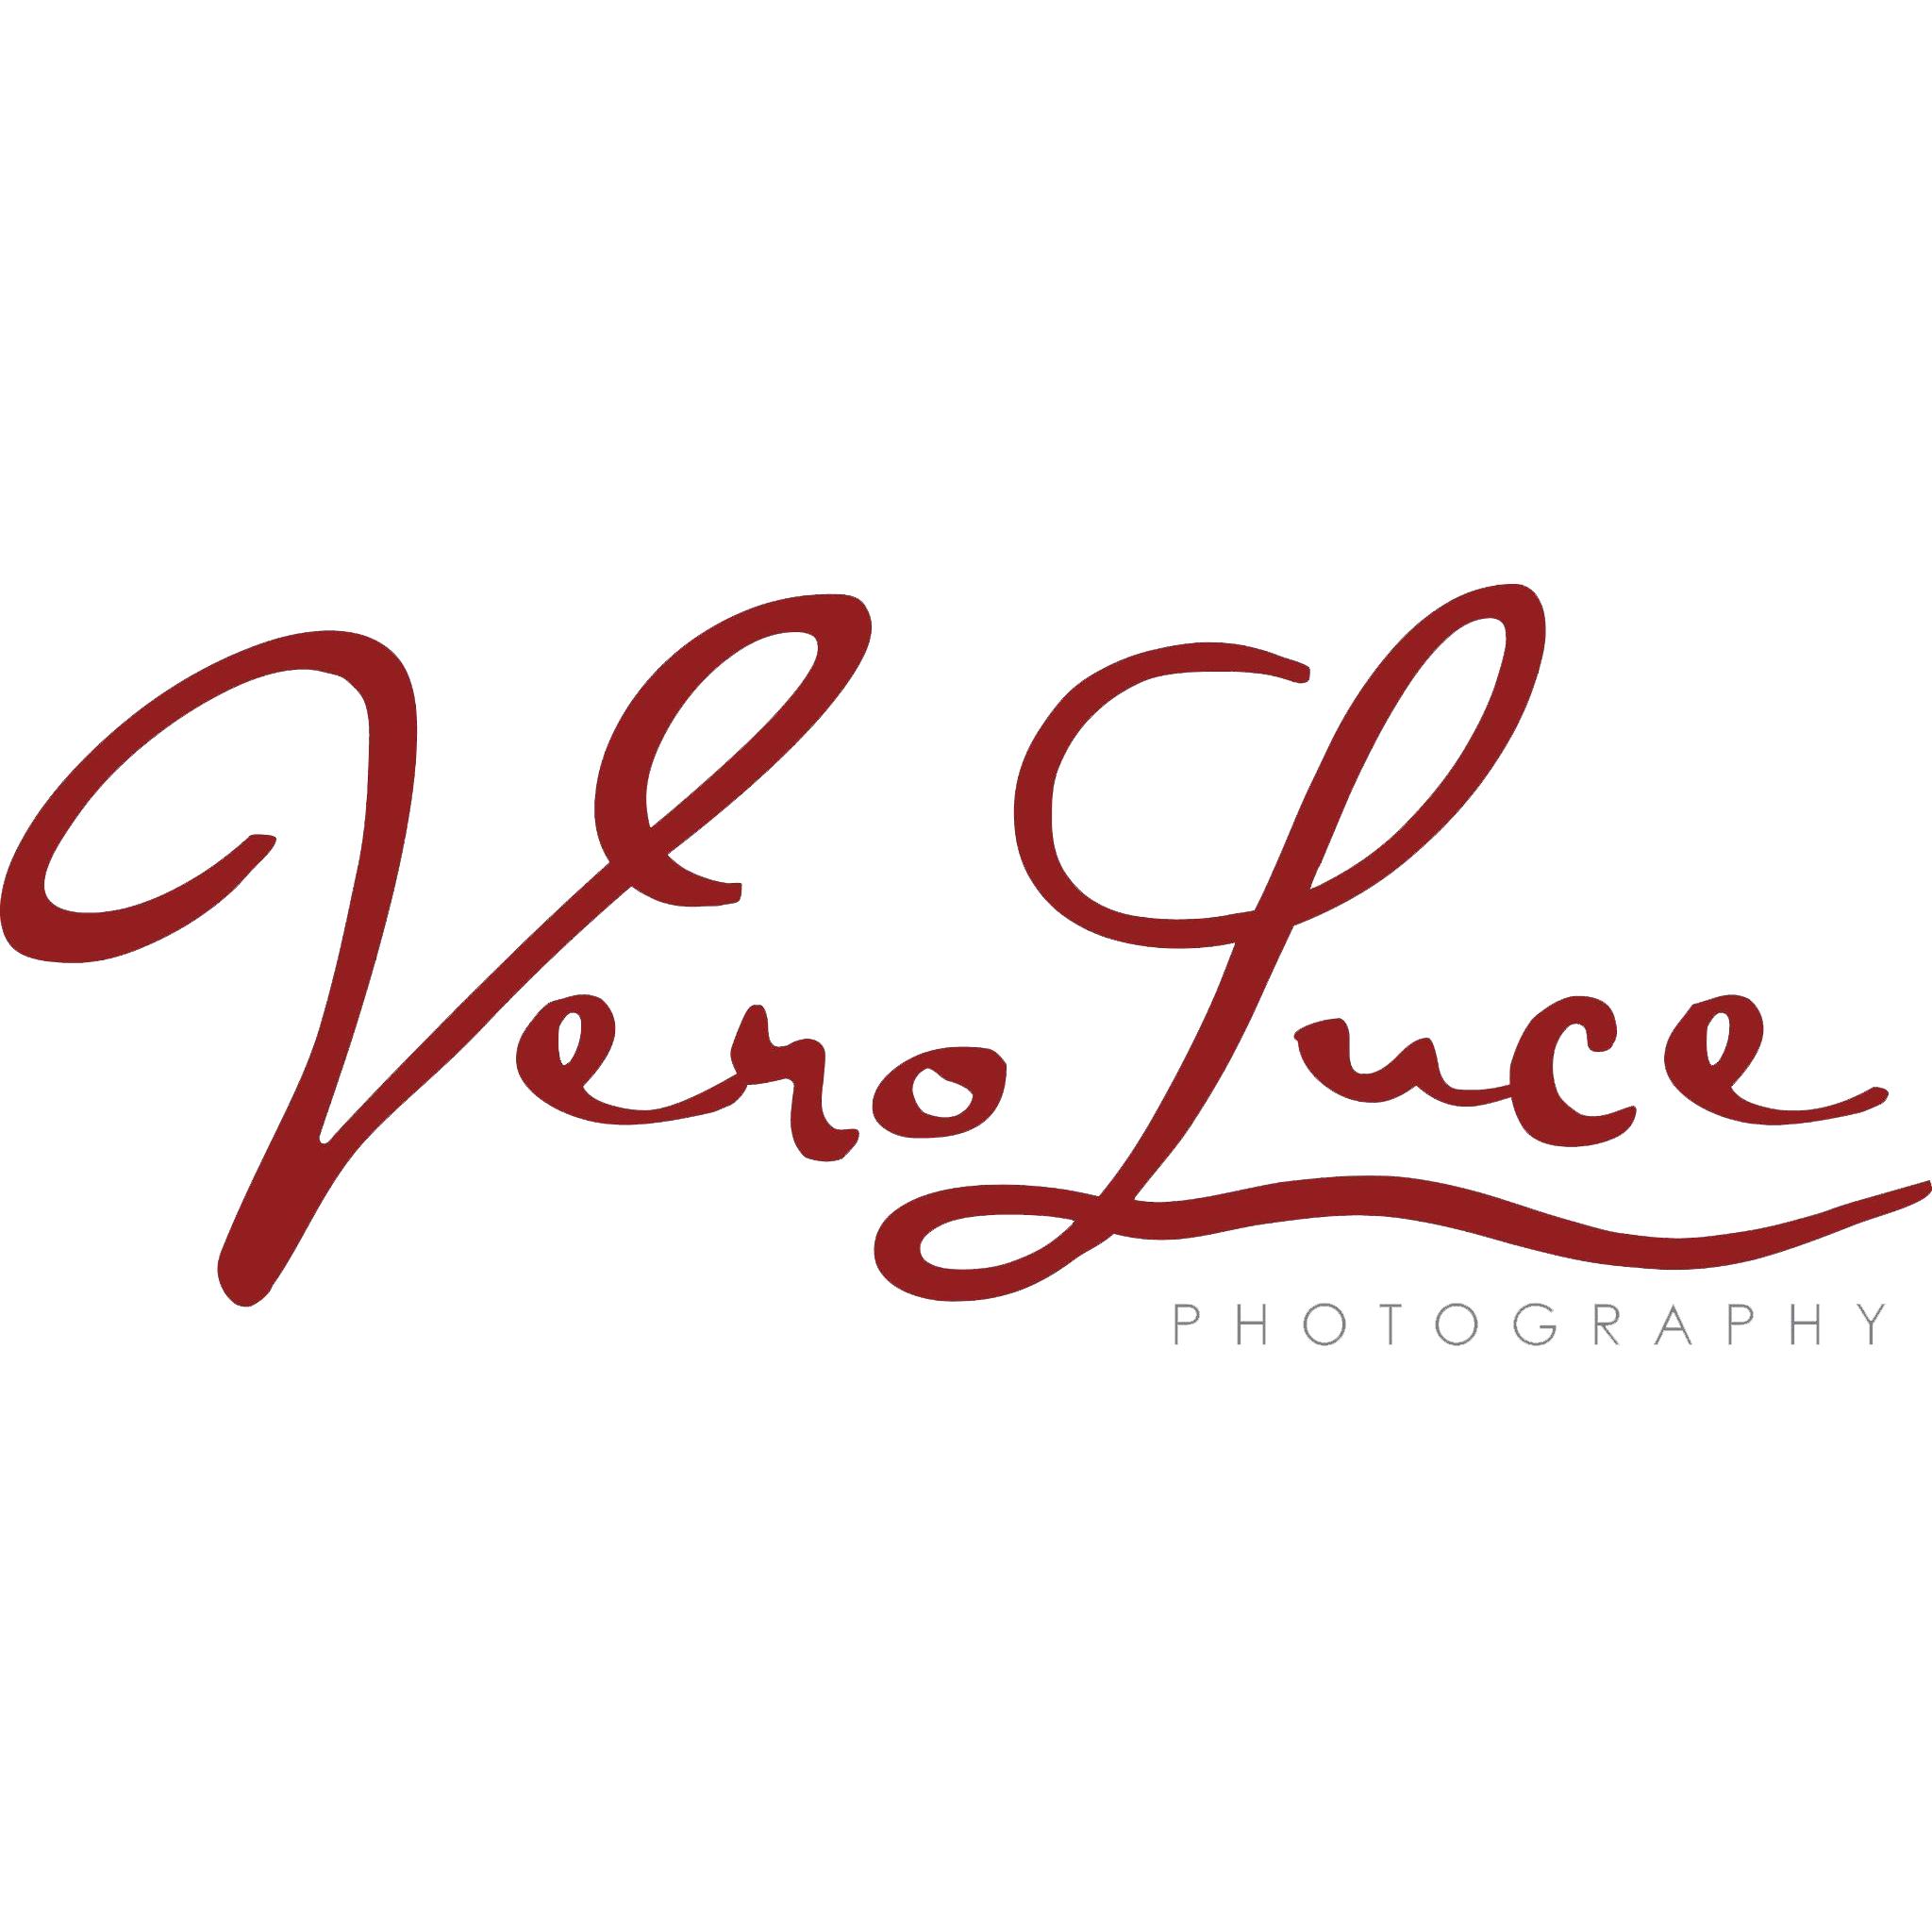 VeroLuce Photography